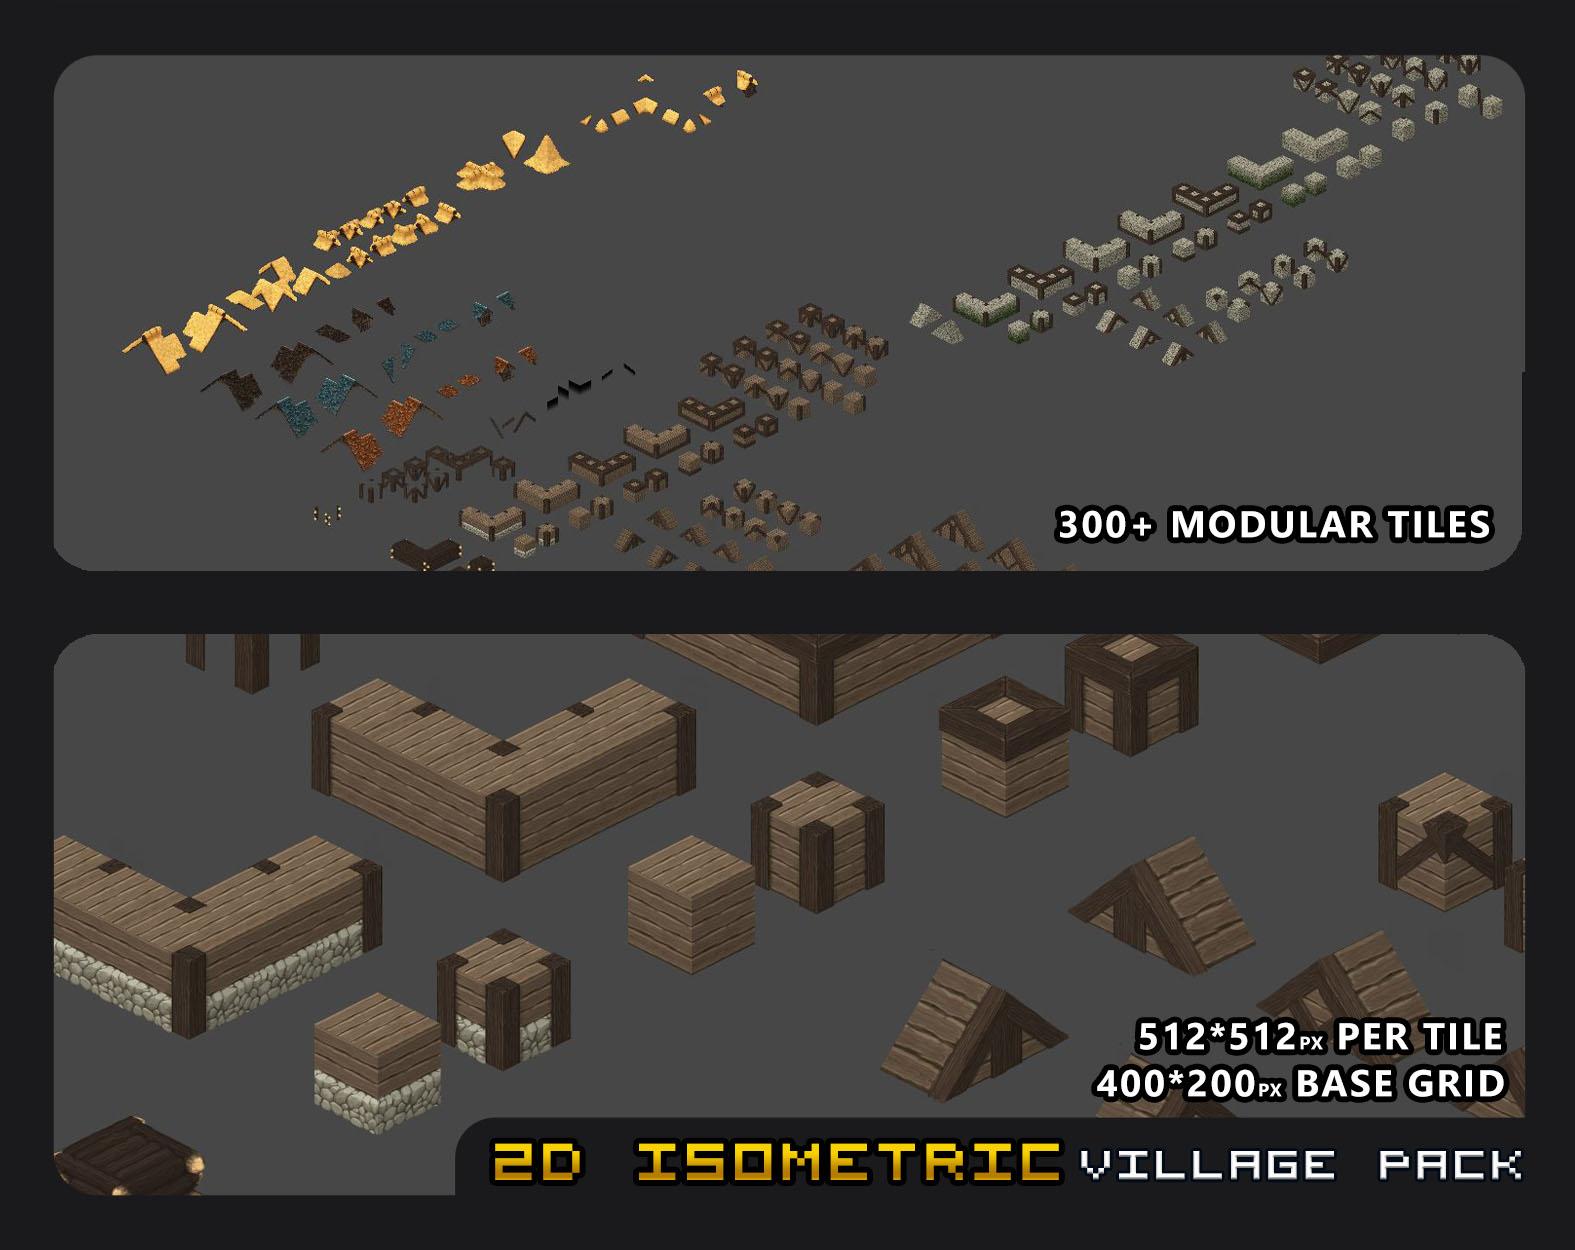 2D Isometric Village Tile Pack by Max Heyder Art (GoldenSkull)